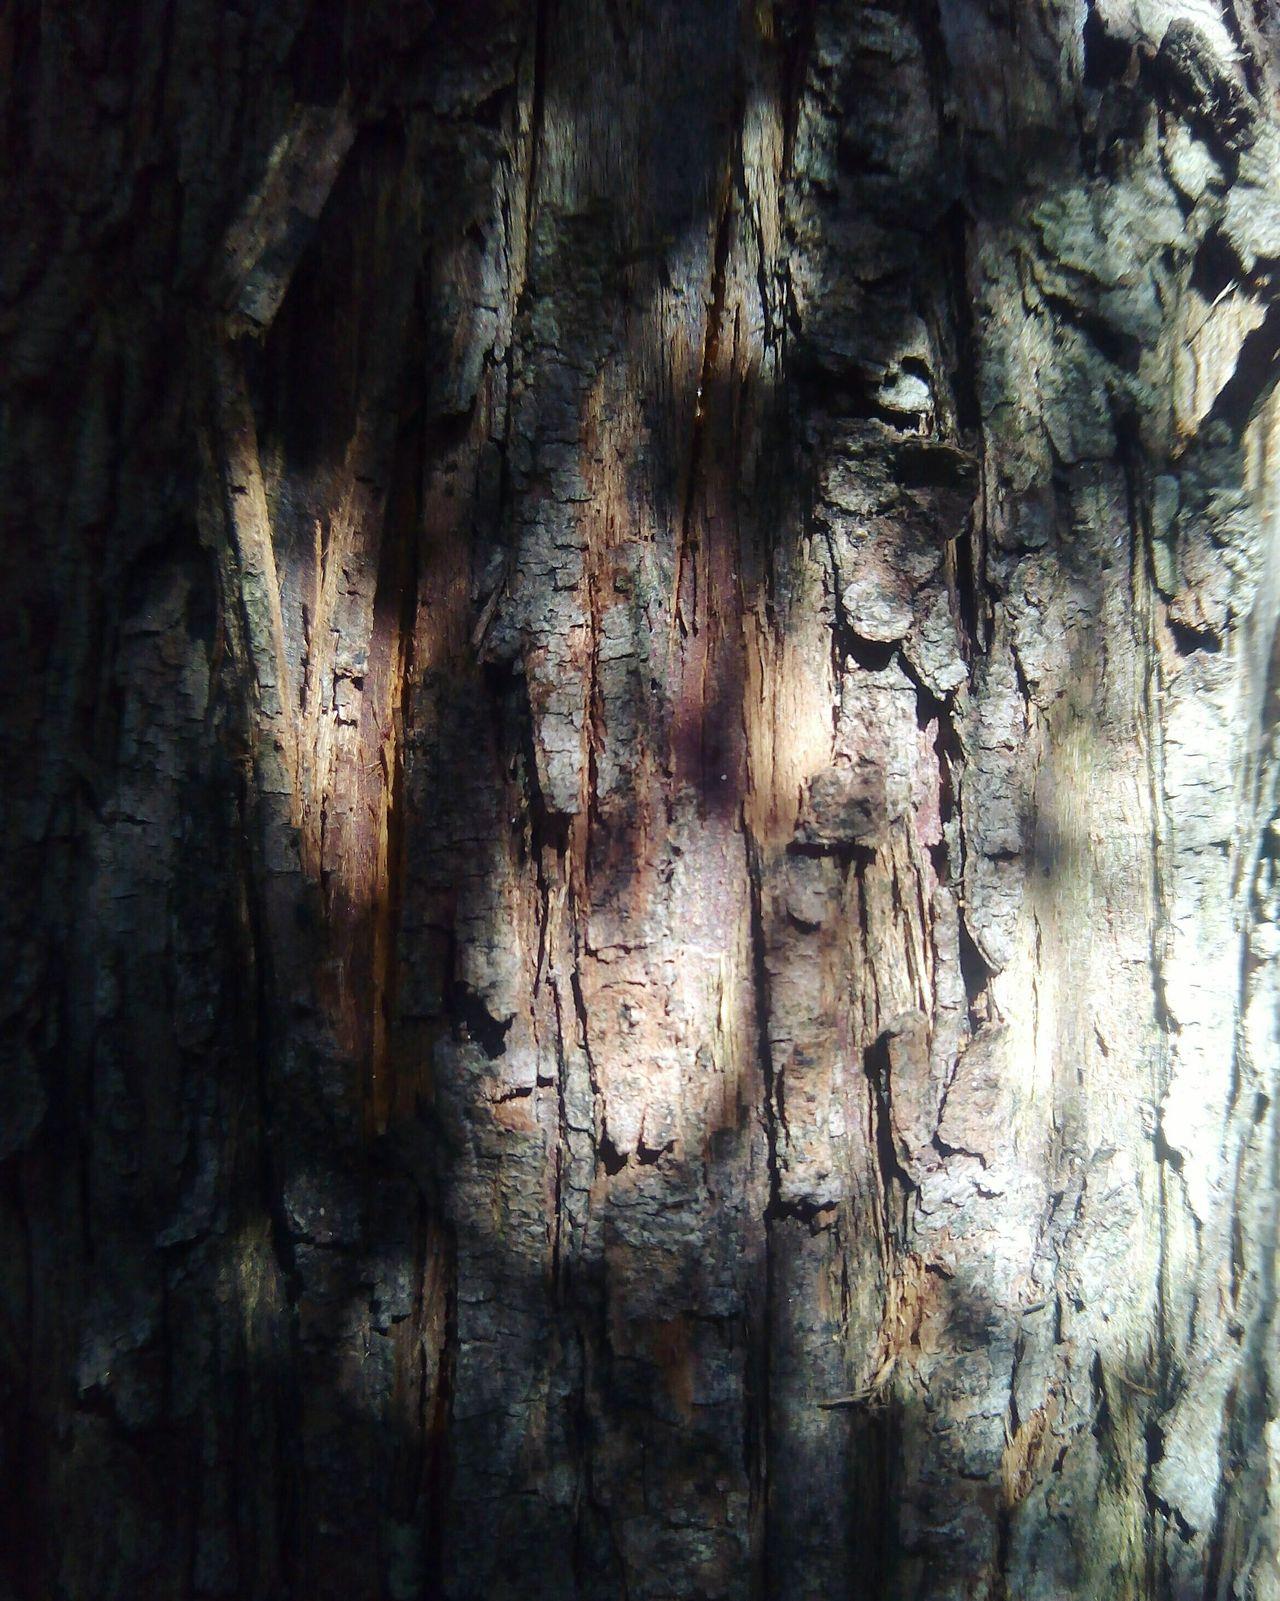 Tree Shadow Textured  Nature Tronco árbol Textura Sombras Naturaleza